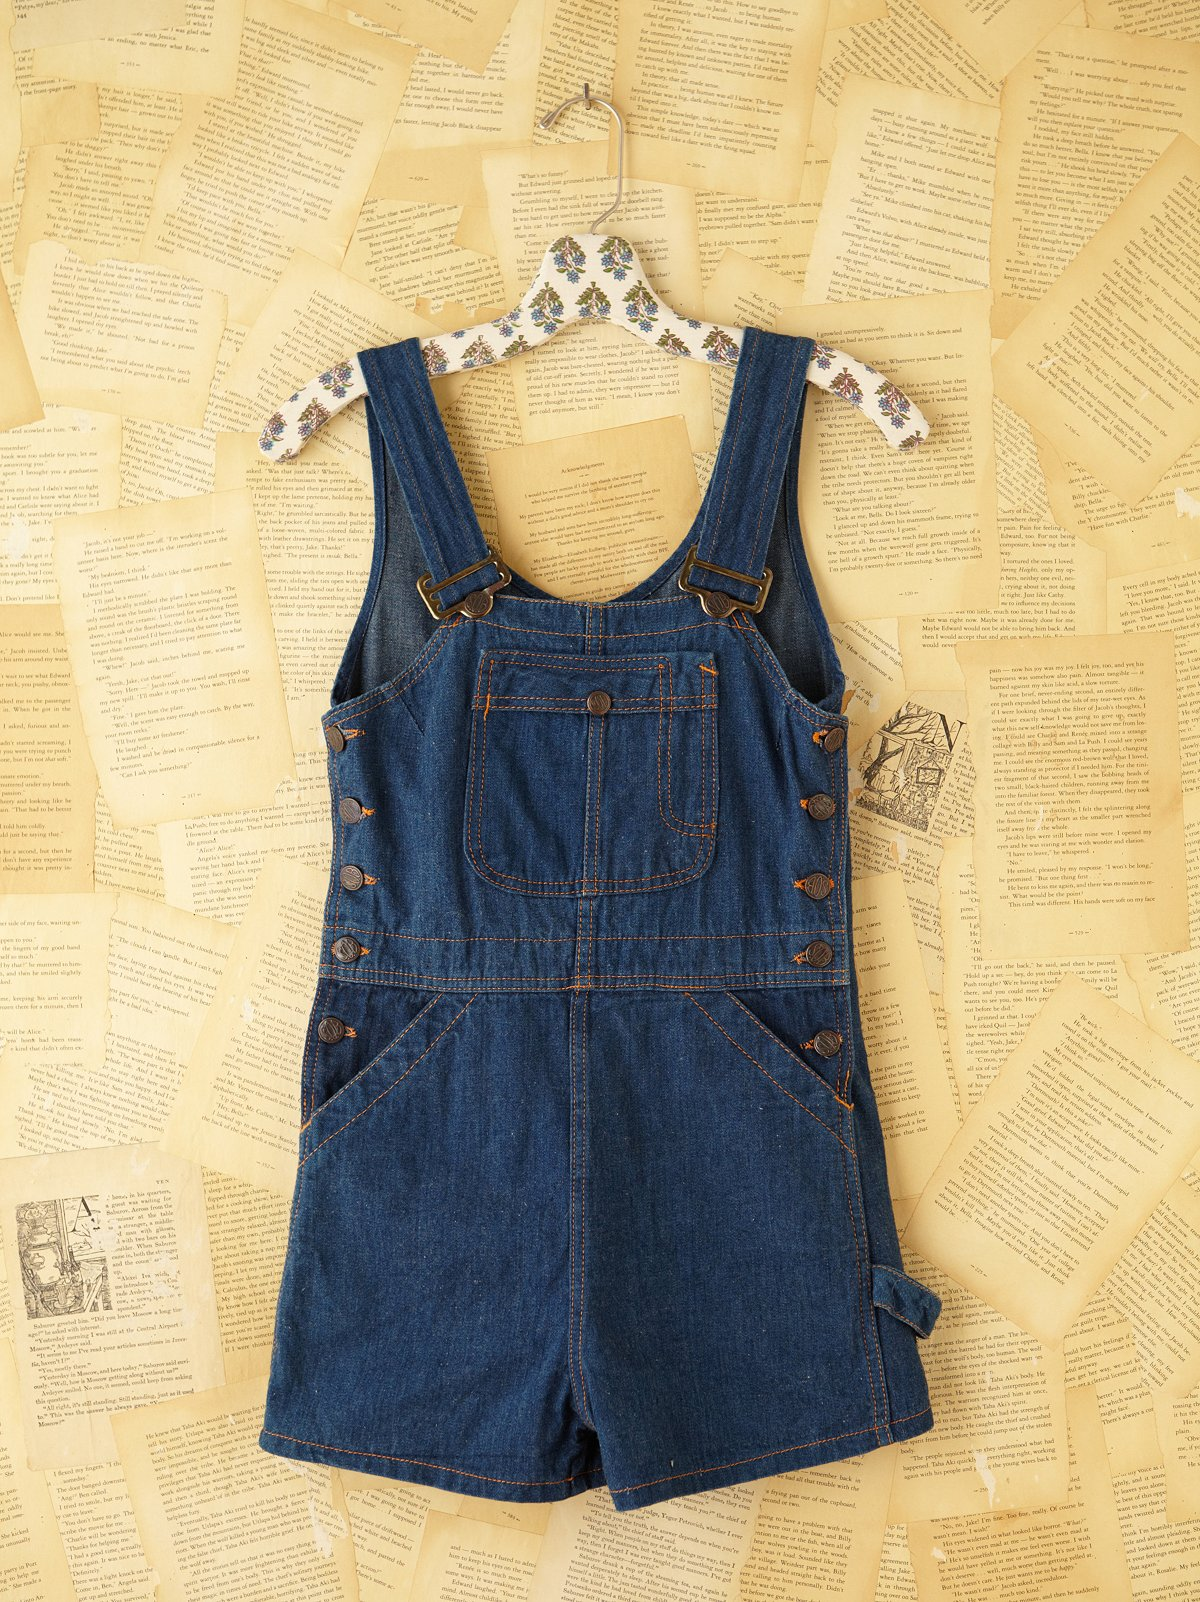 Vintage Denim Overall Shorts